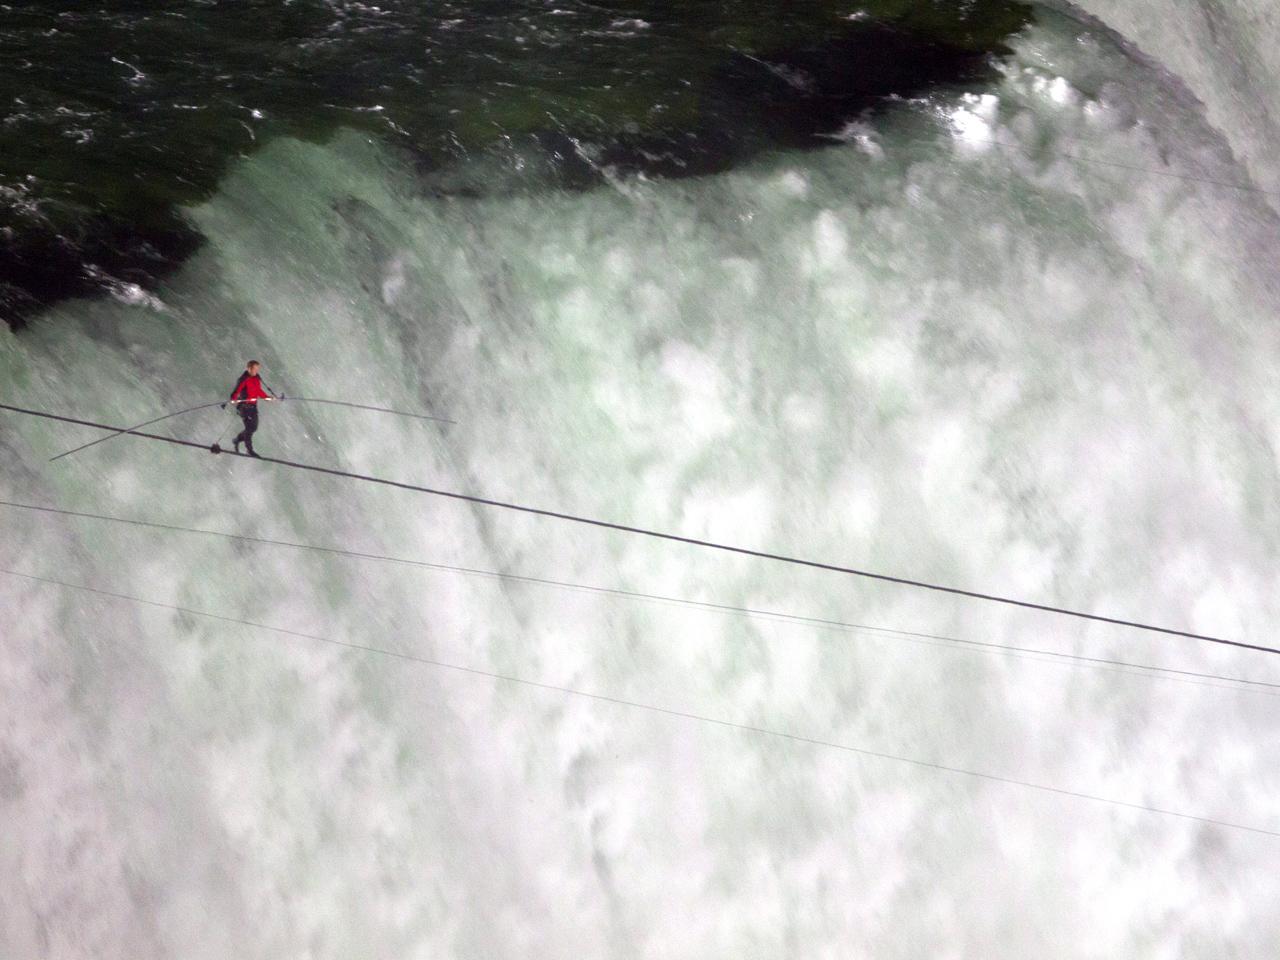 Daredevil Nik Wallenda completes Niagara Falls tightrope